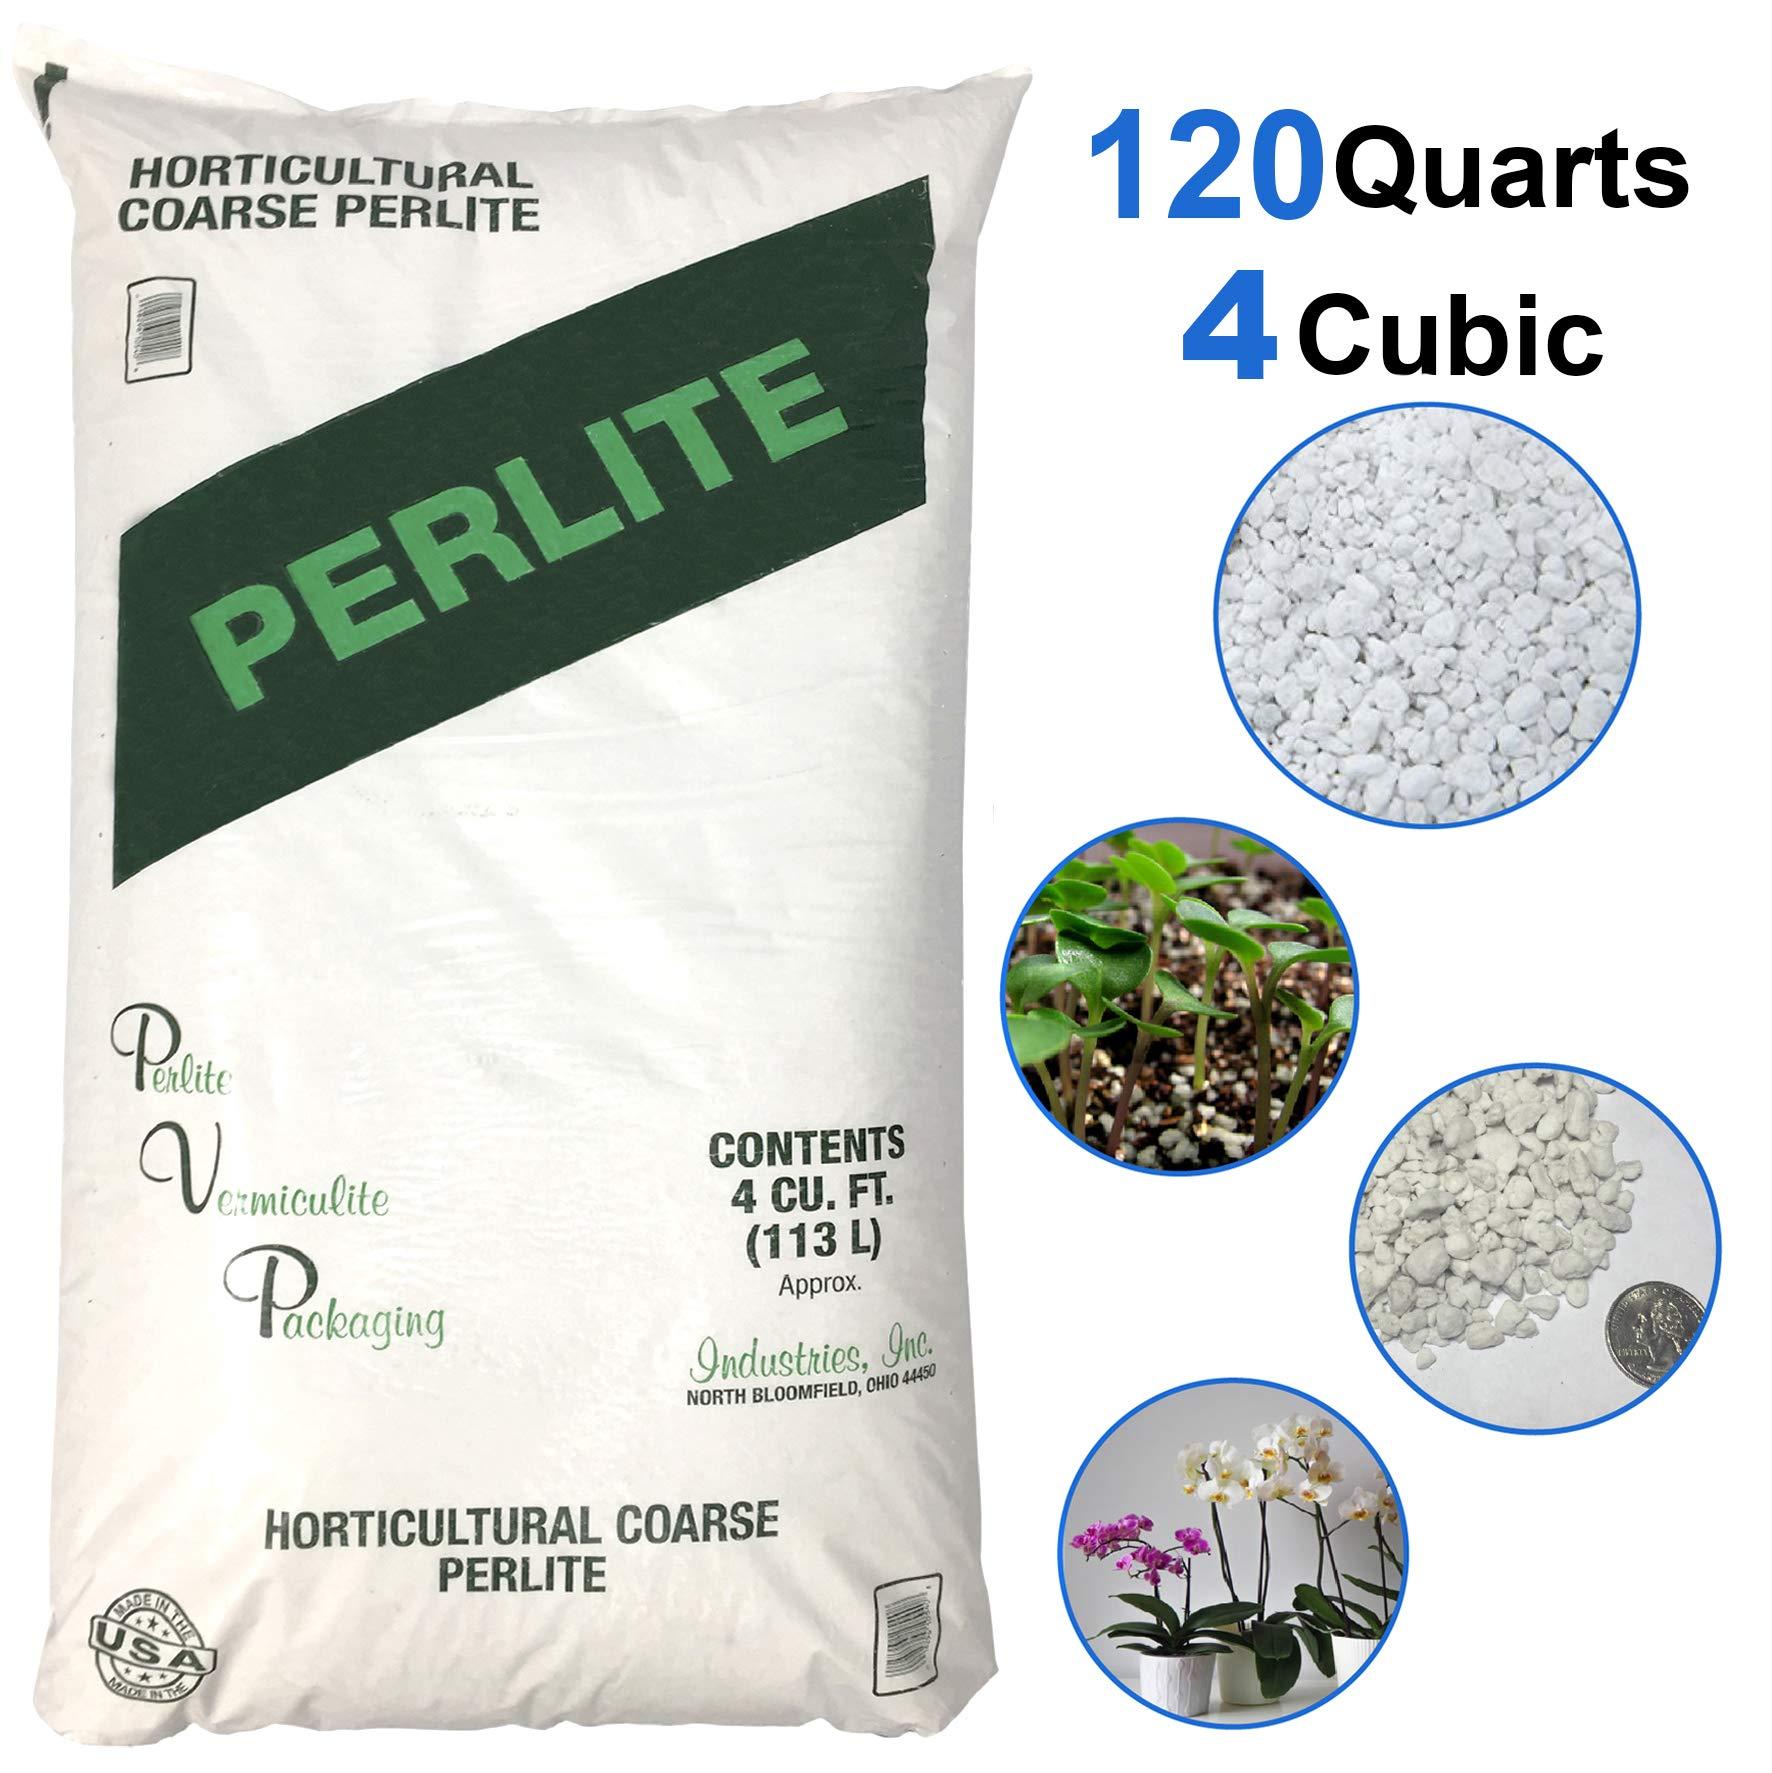 carnivorous plant soil mix growing media 1 Liter clean Perlite